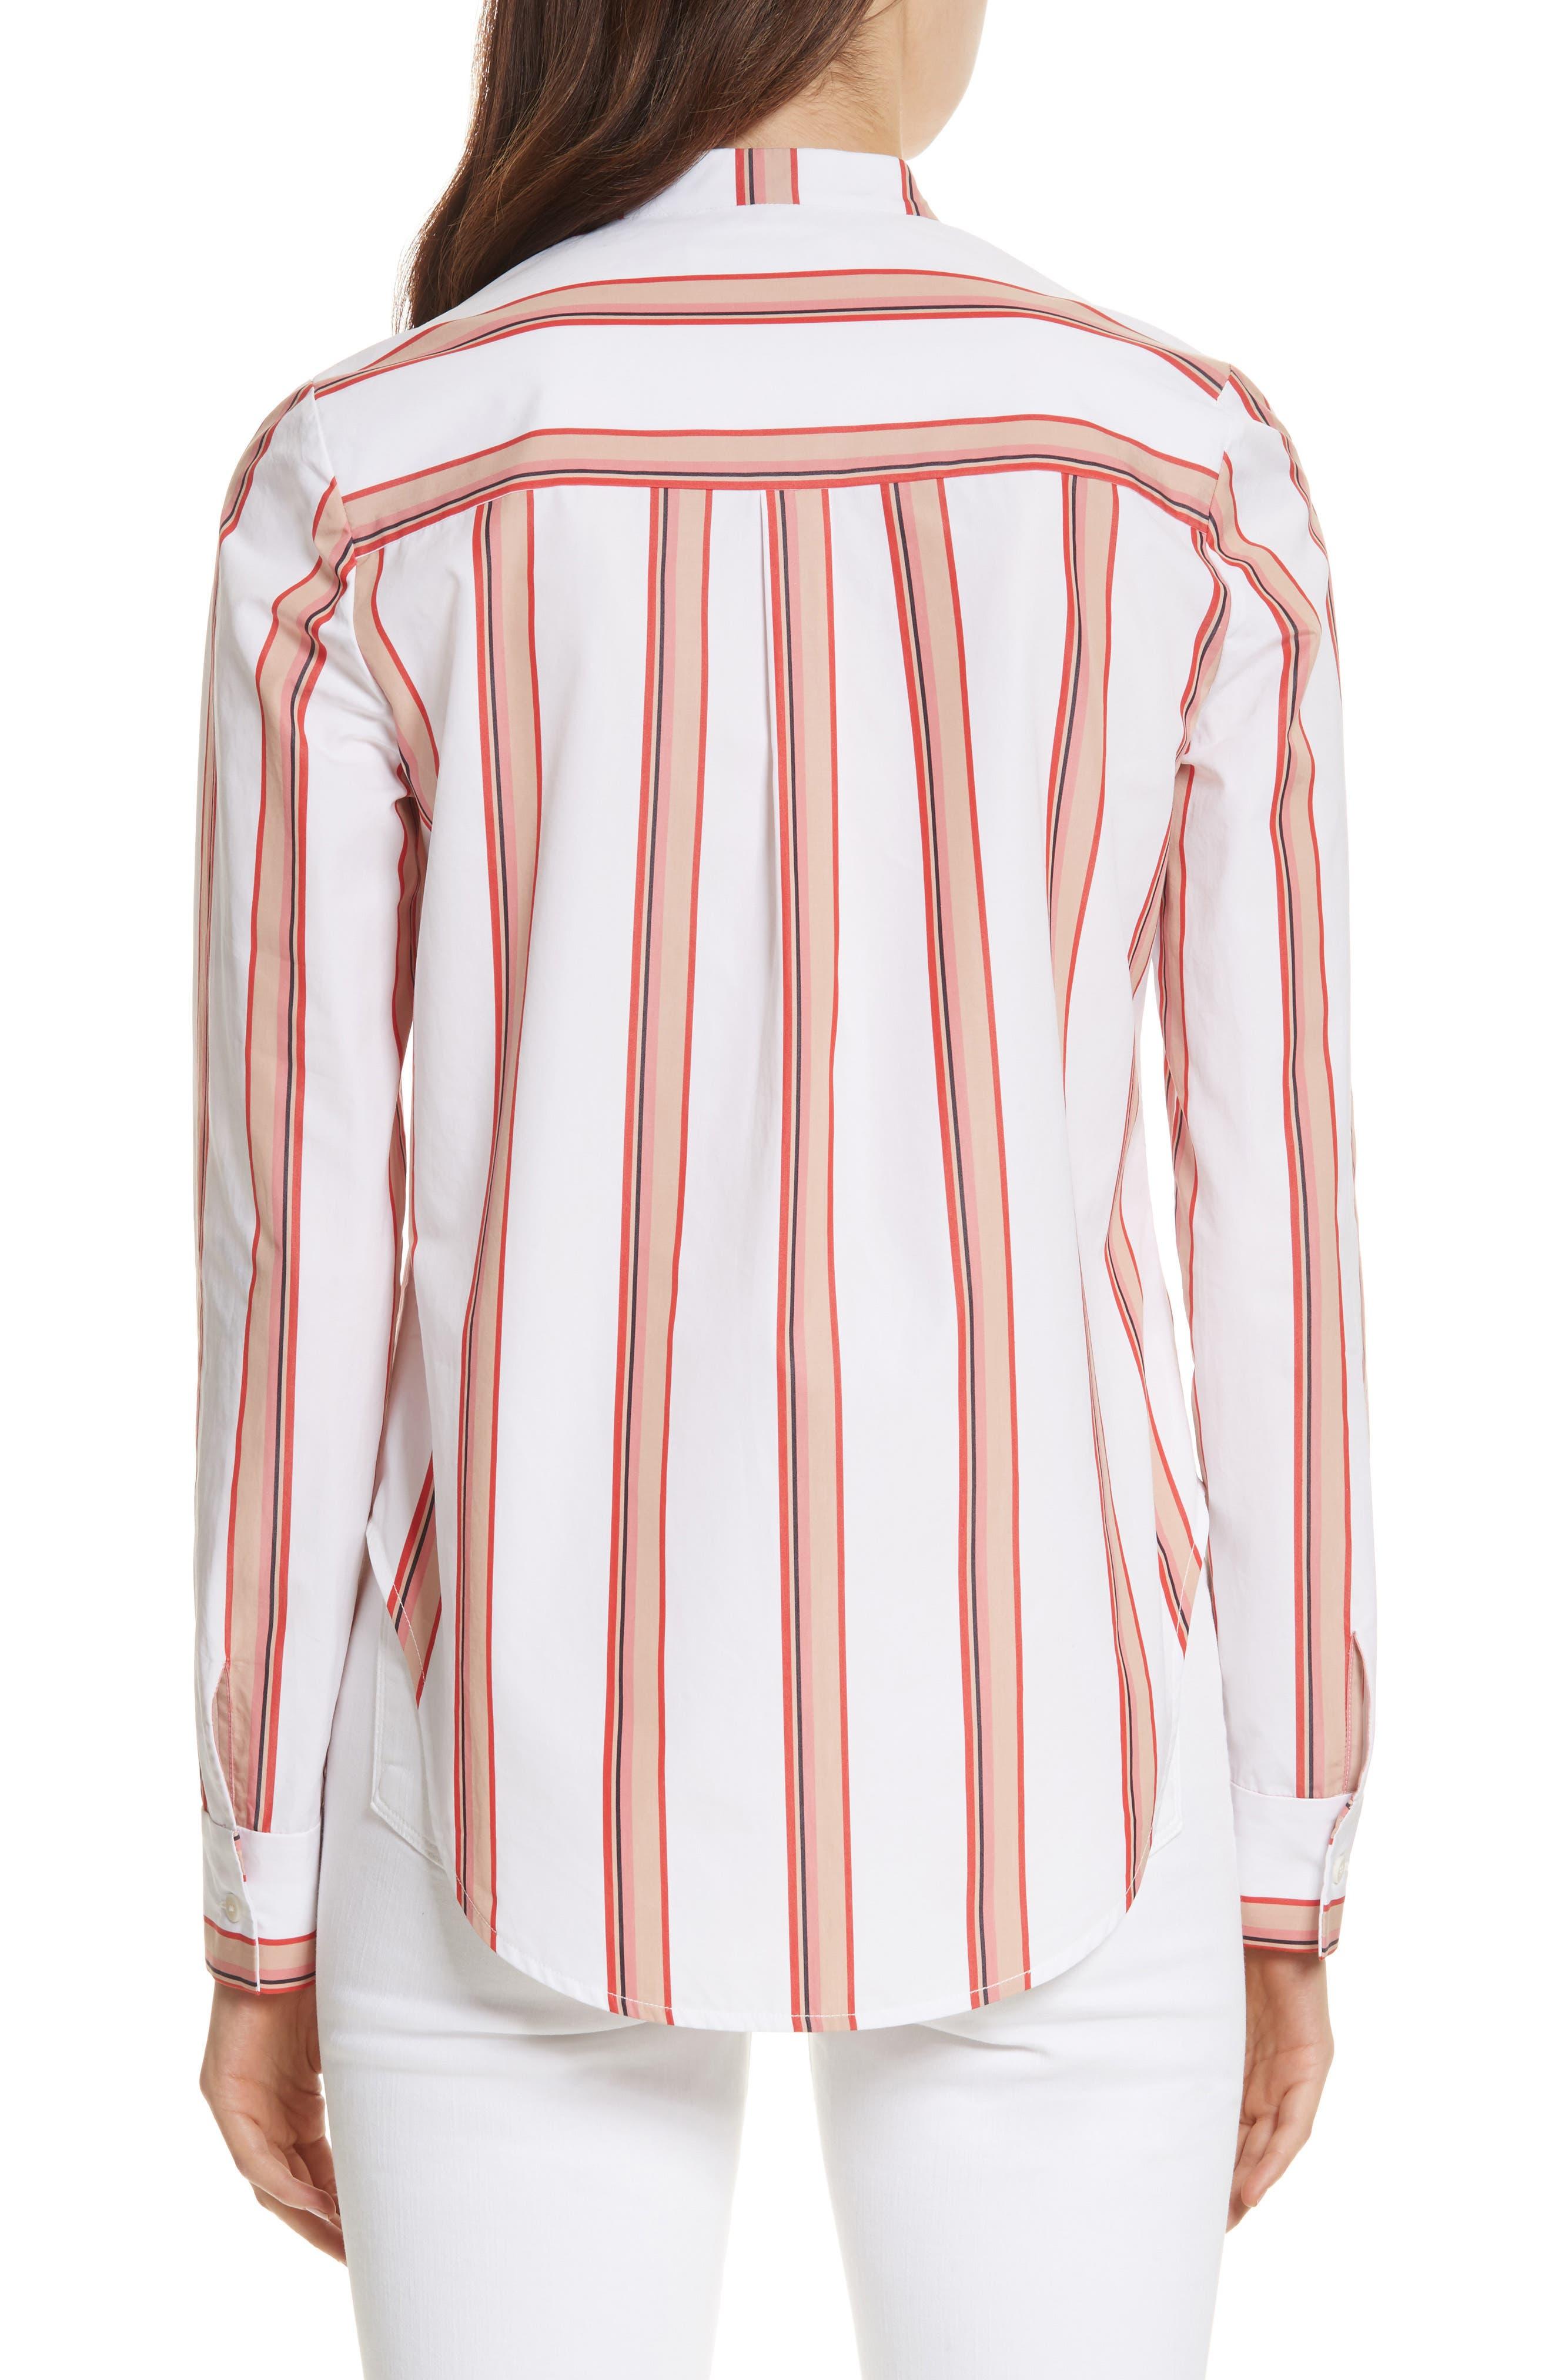 Diane von Furstenberg Stripe Shirt,                             Alternate thumbnail 2, color,                             107